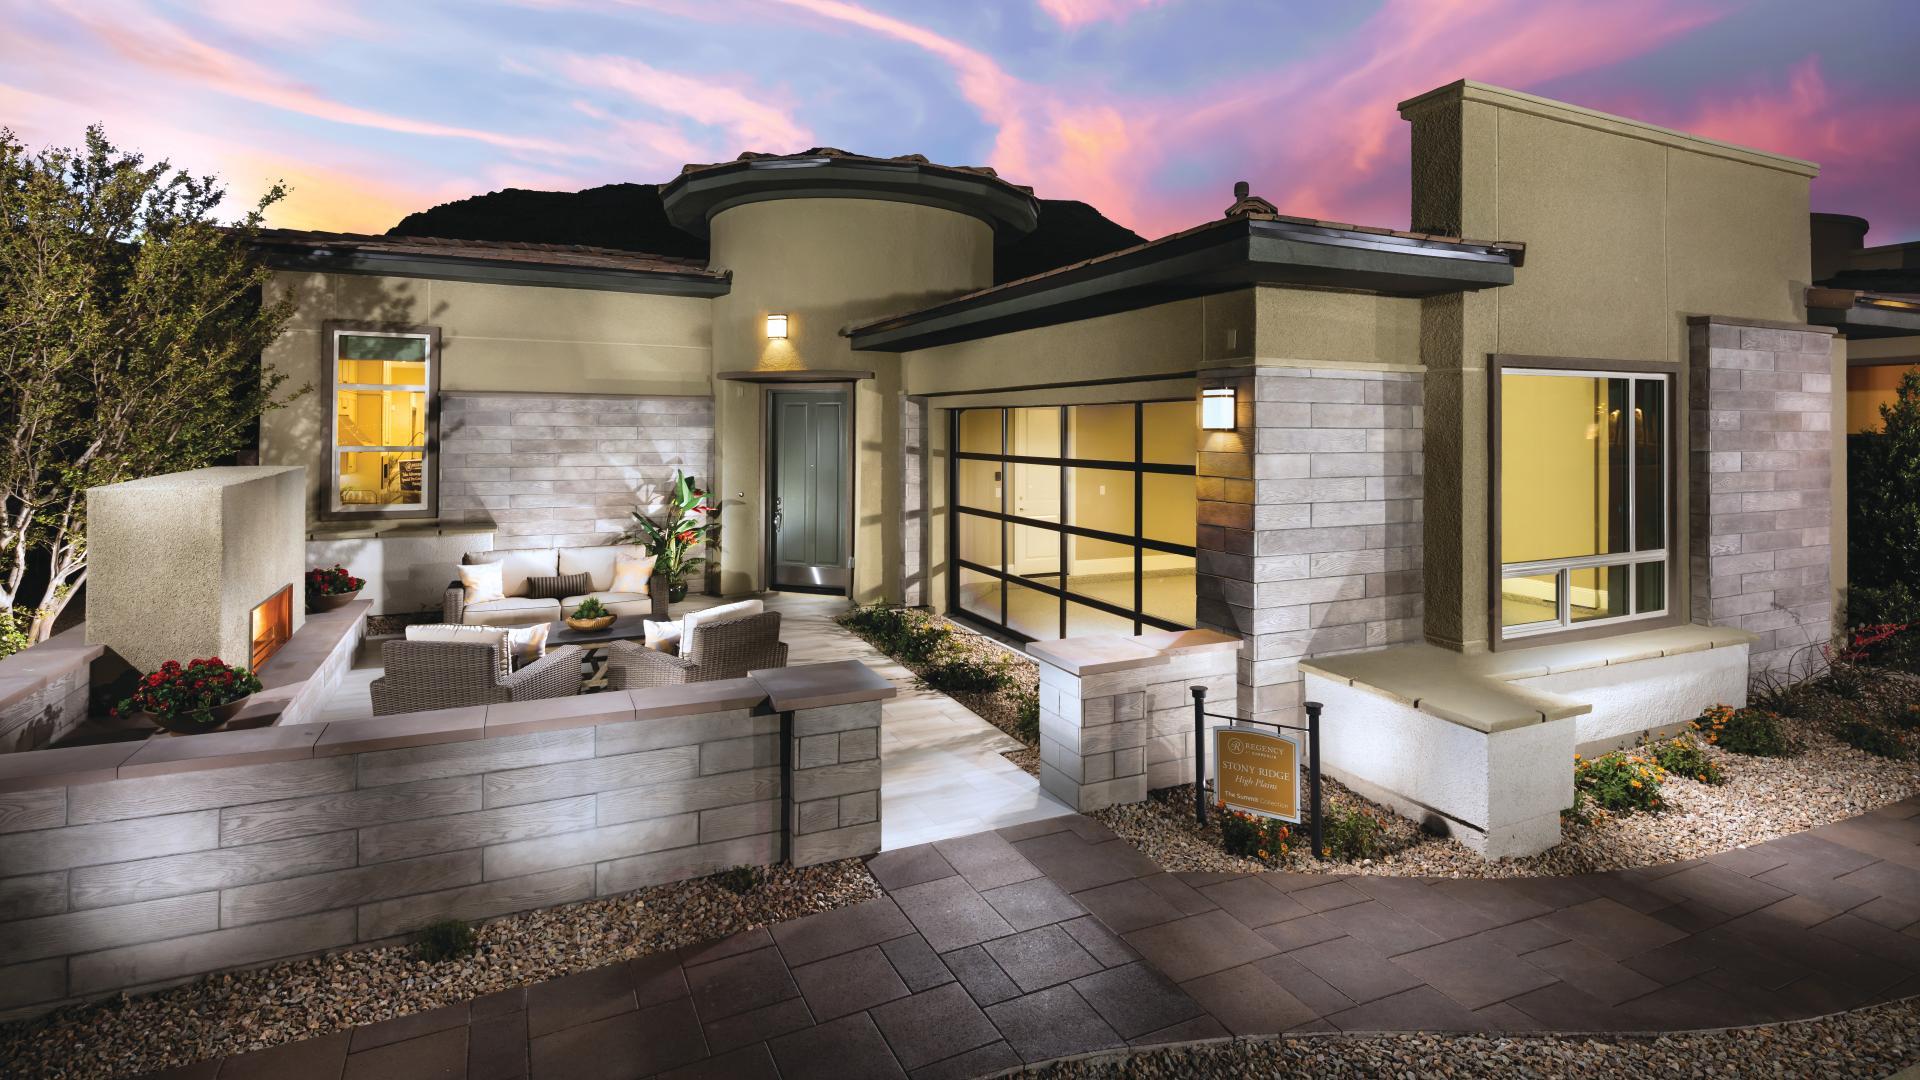 Stunning single-story home designs